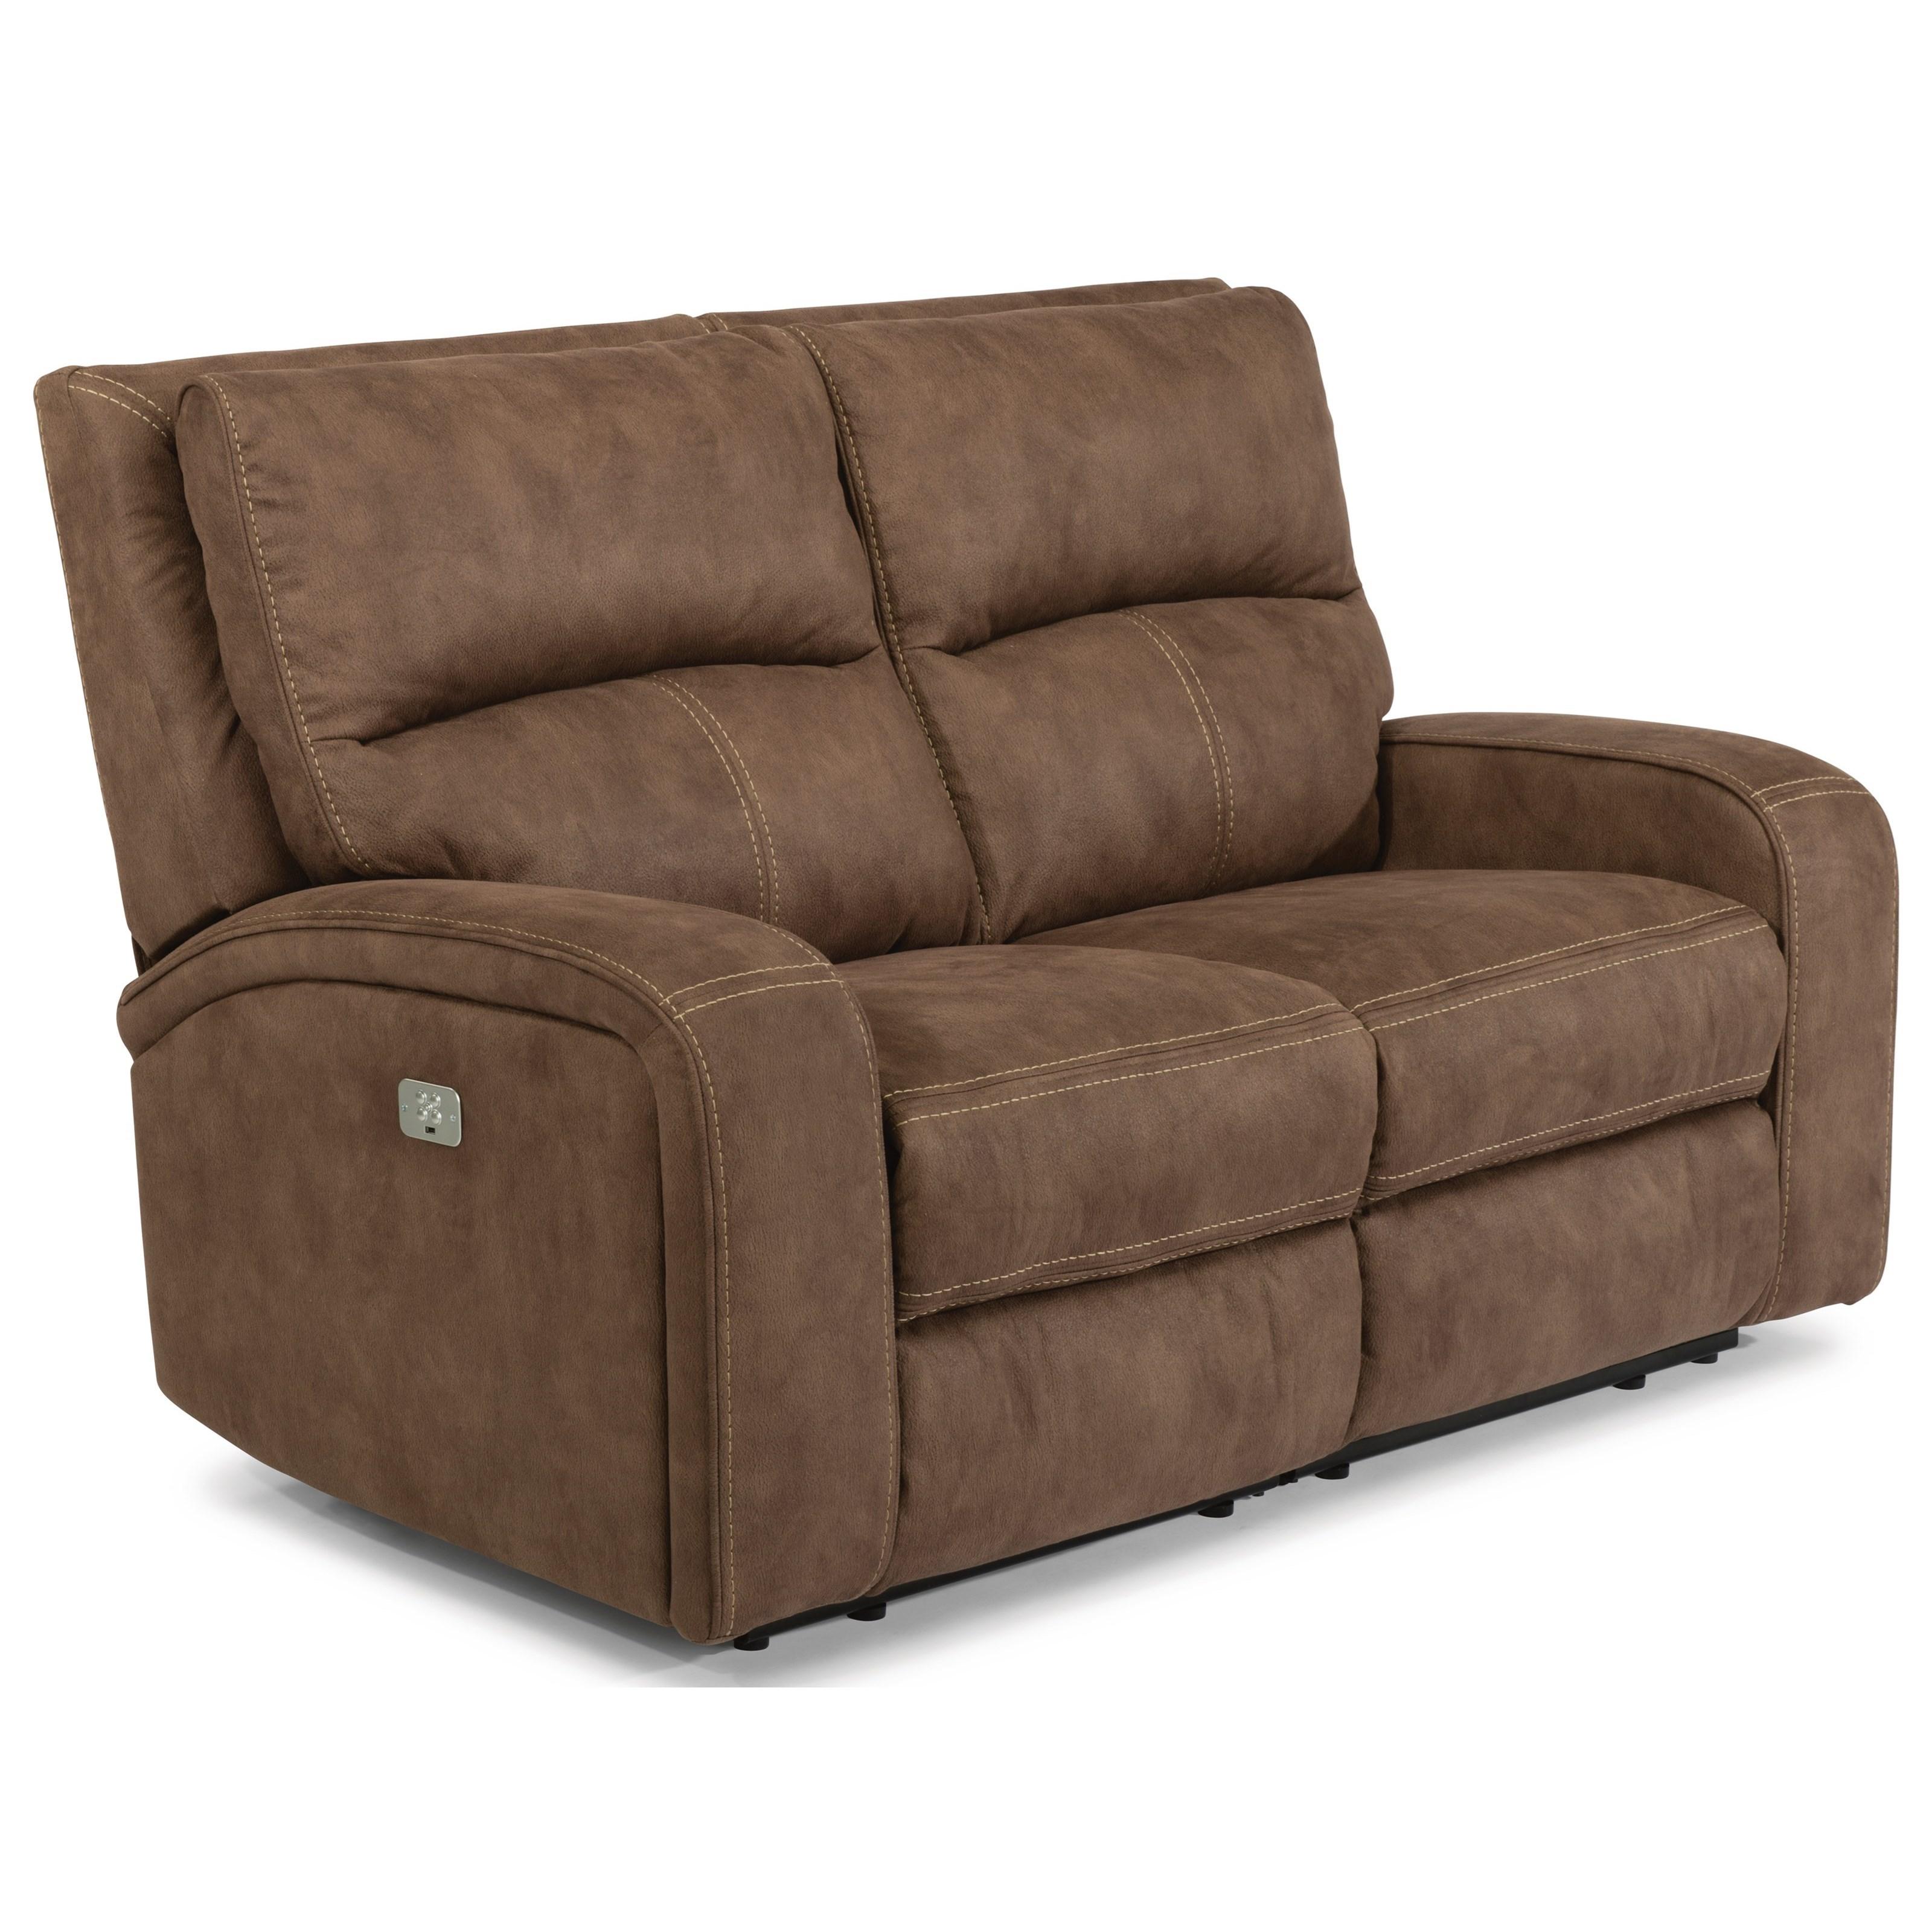 Latitudes - Nirvana Power Reclining Loveseat with Power Headrest by Flexsteel at Walker's Furniture